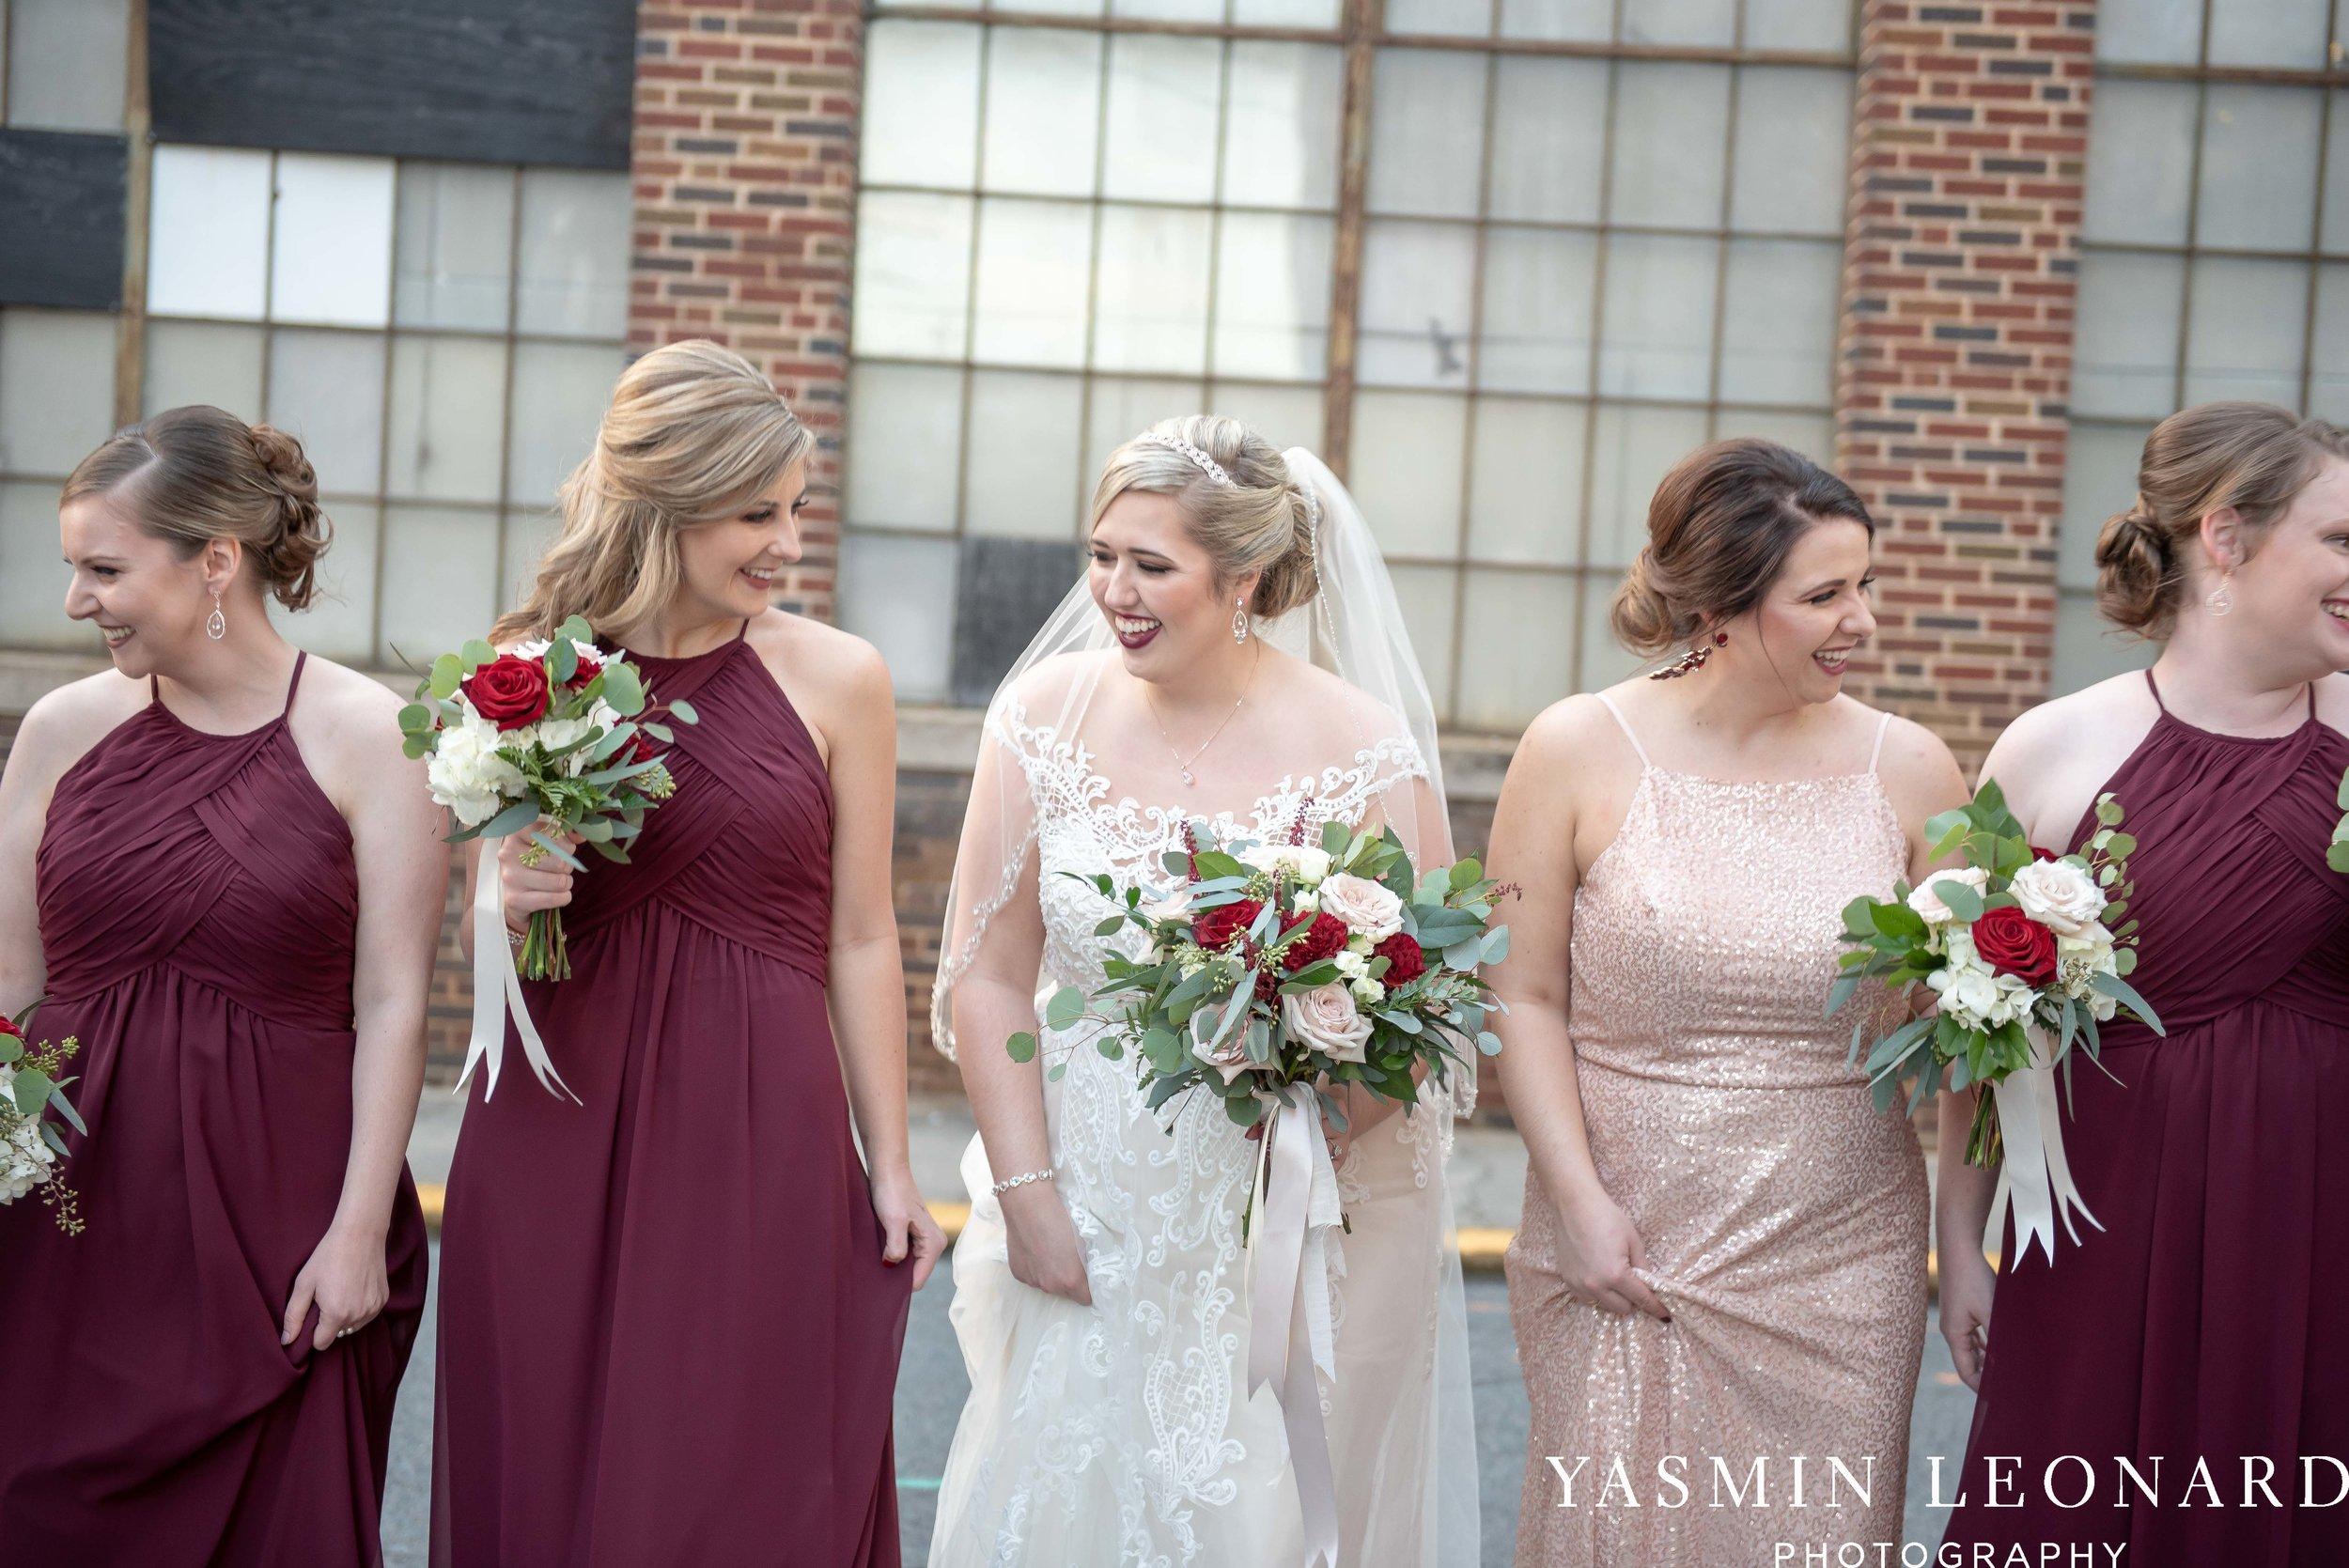 Rebekah and Matt - 105 Worth Event Centre - Yasmin Leonard Photography - Asheboro Wedding - NC Wedding - High Point Weddings - Triad Weddings - Winter Wedding-10.jpg